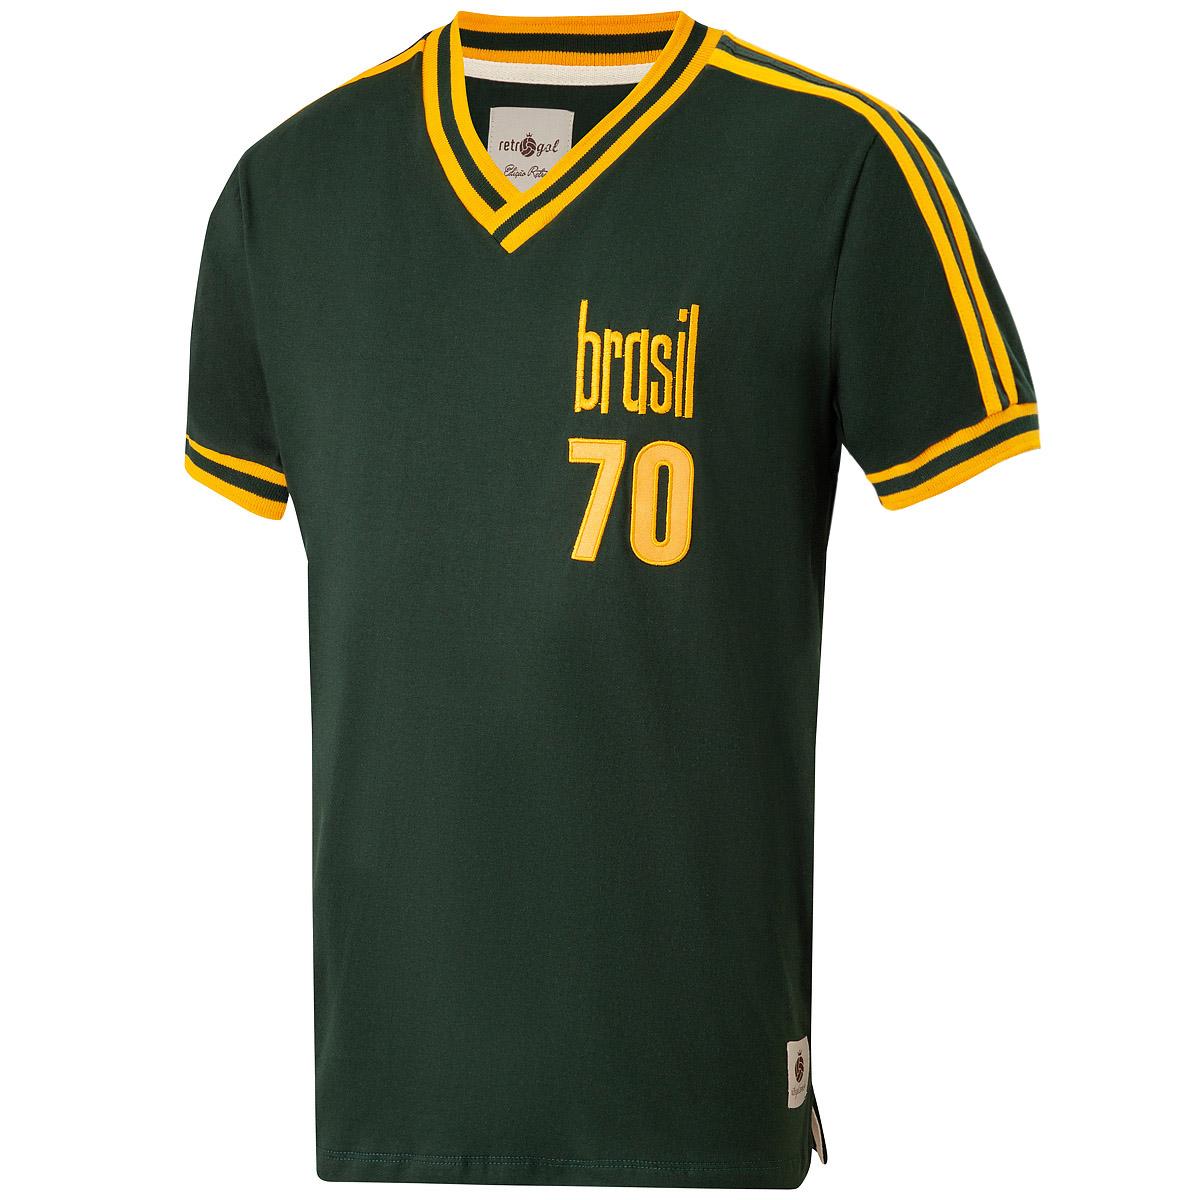 Camisa Brasil Retrô Treino 1970 Masculina